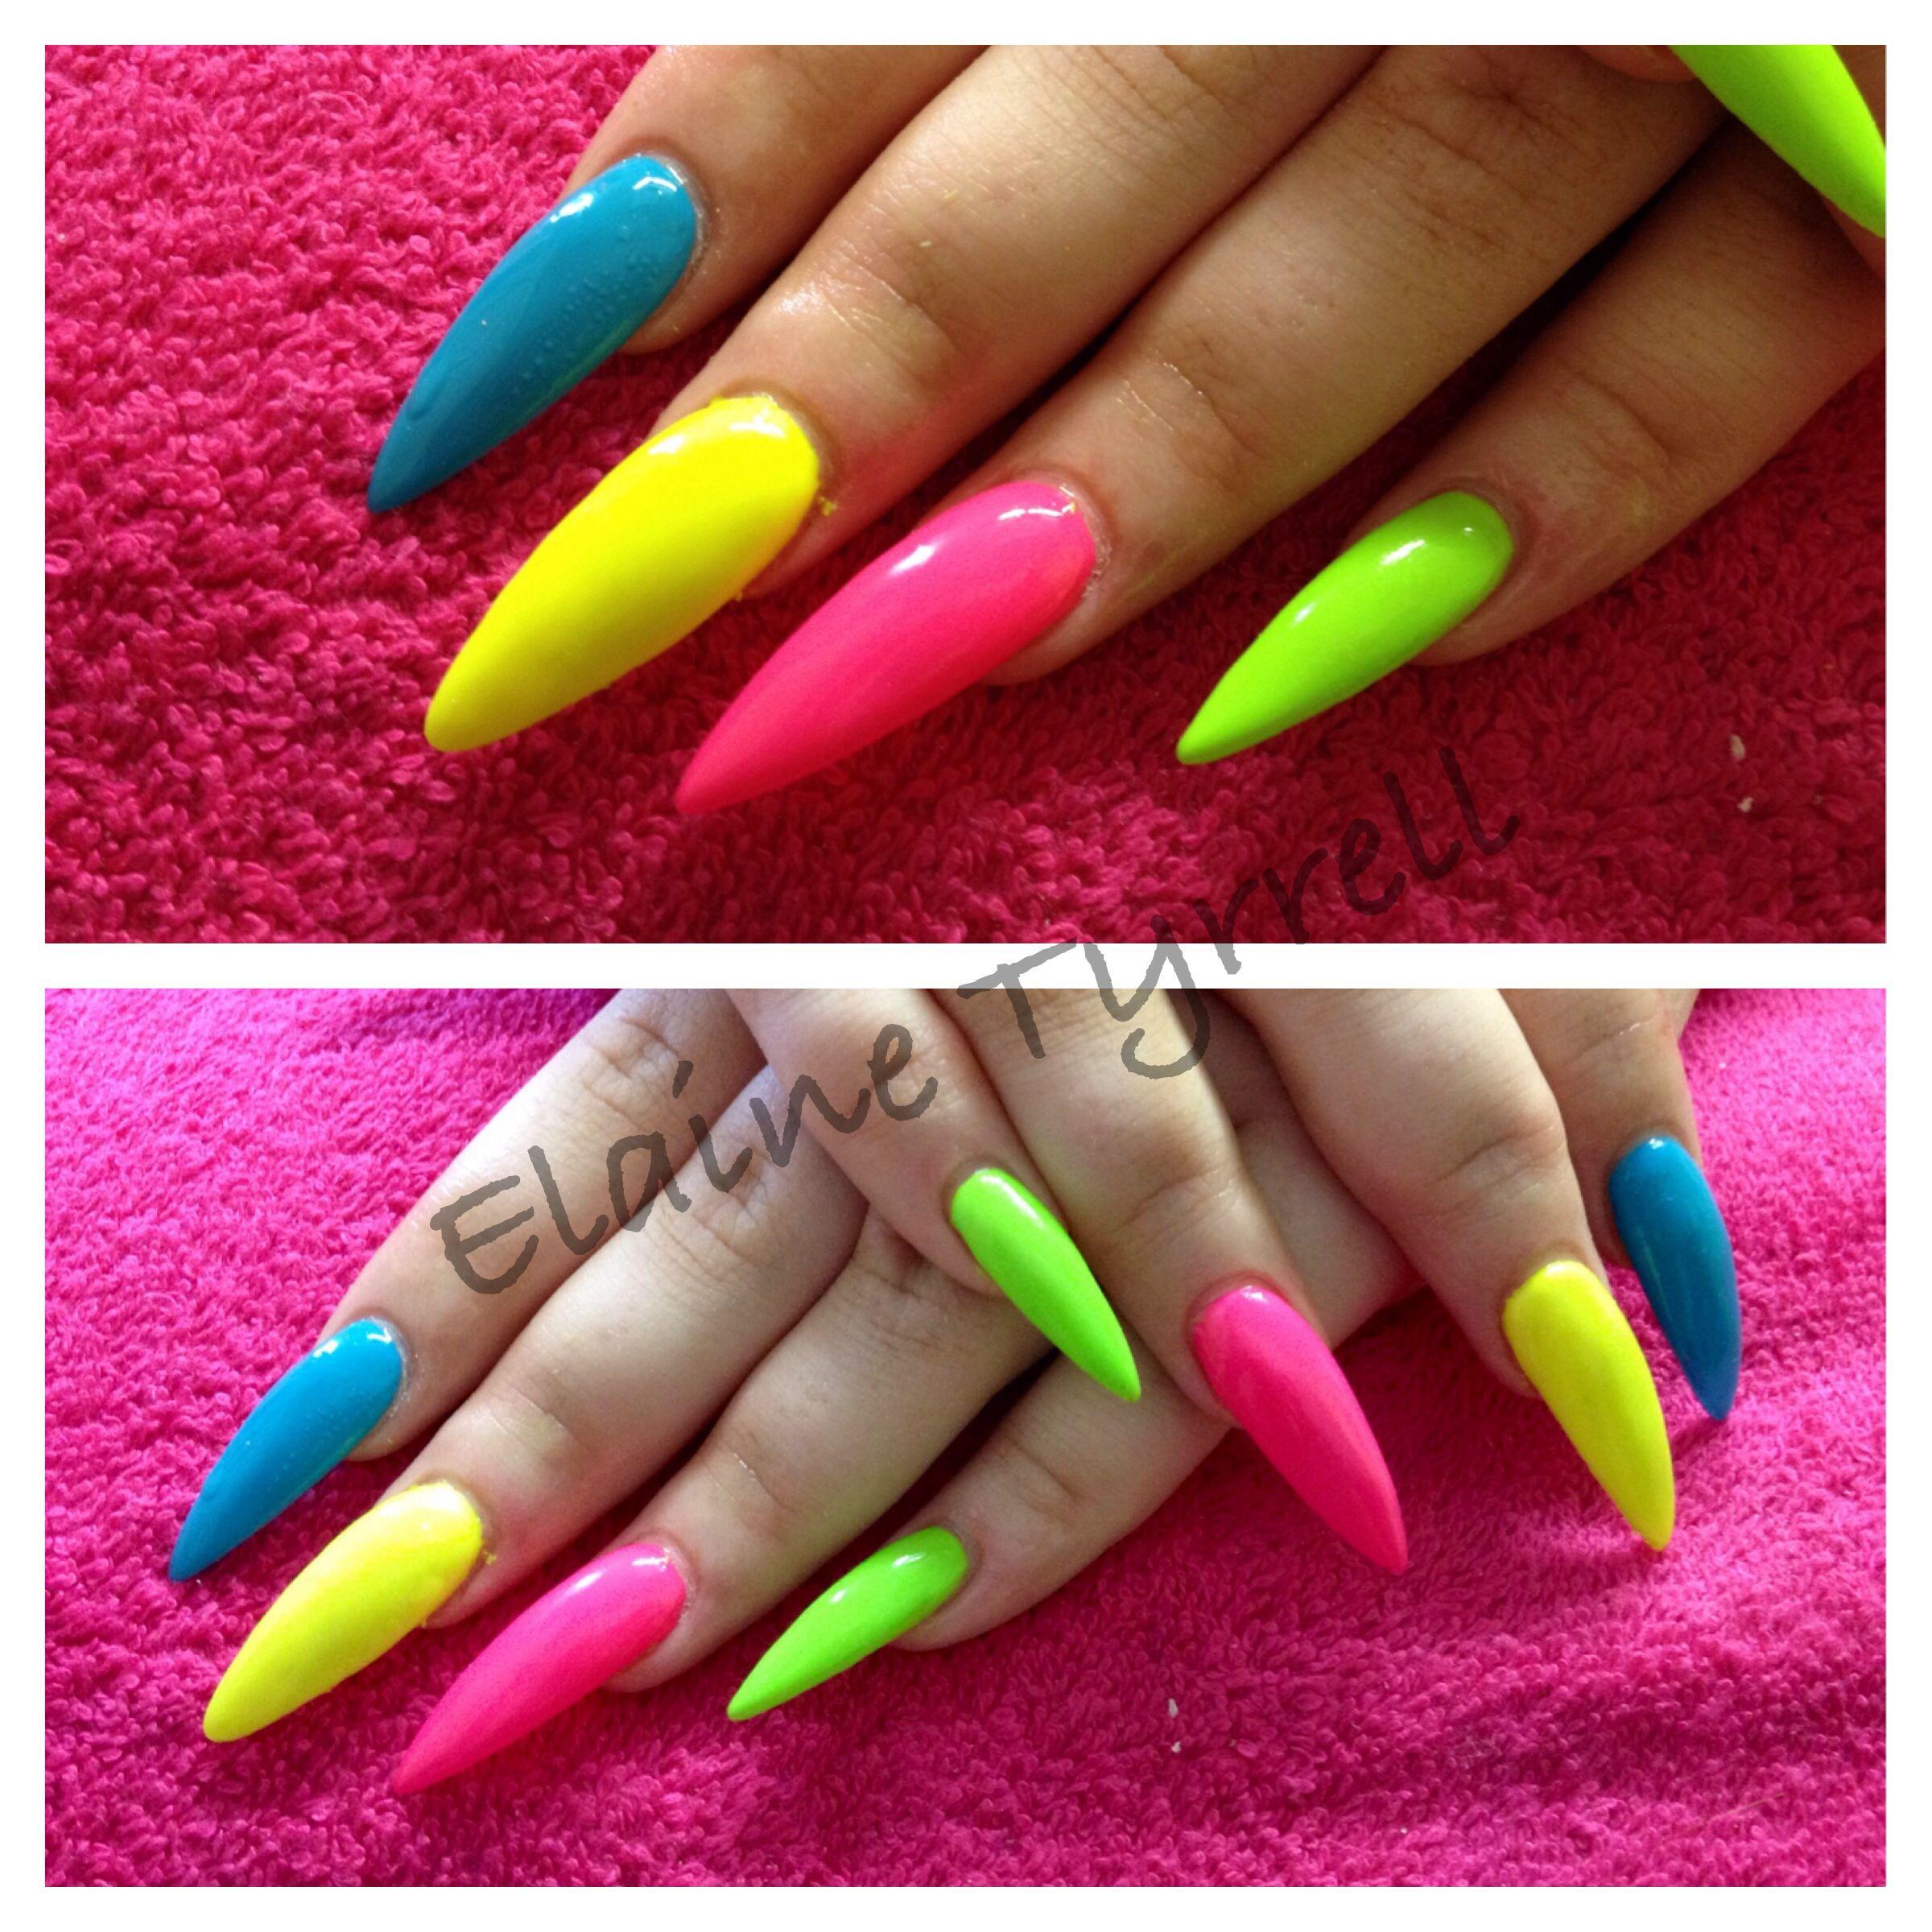 Neon Stiletto Nails